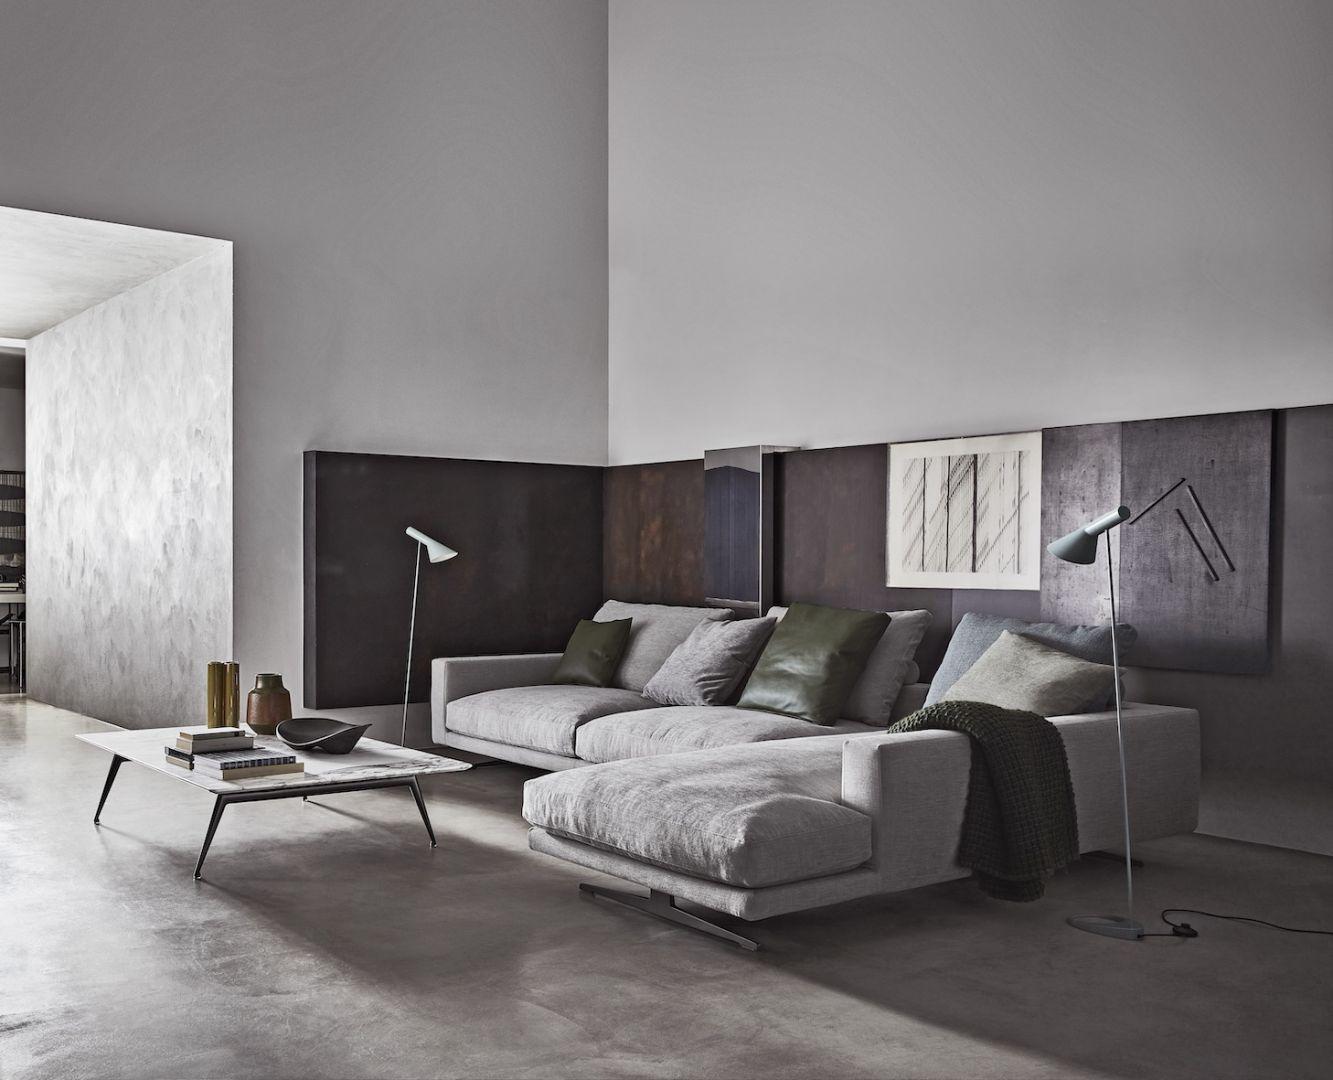 Sofa Campiello. mMarka Flexform/Mood Design